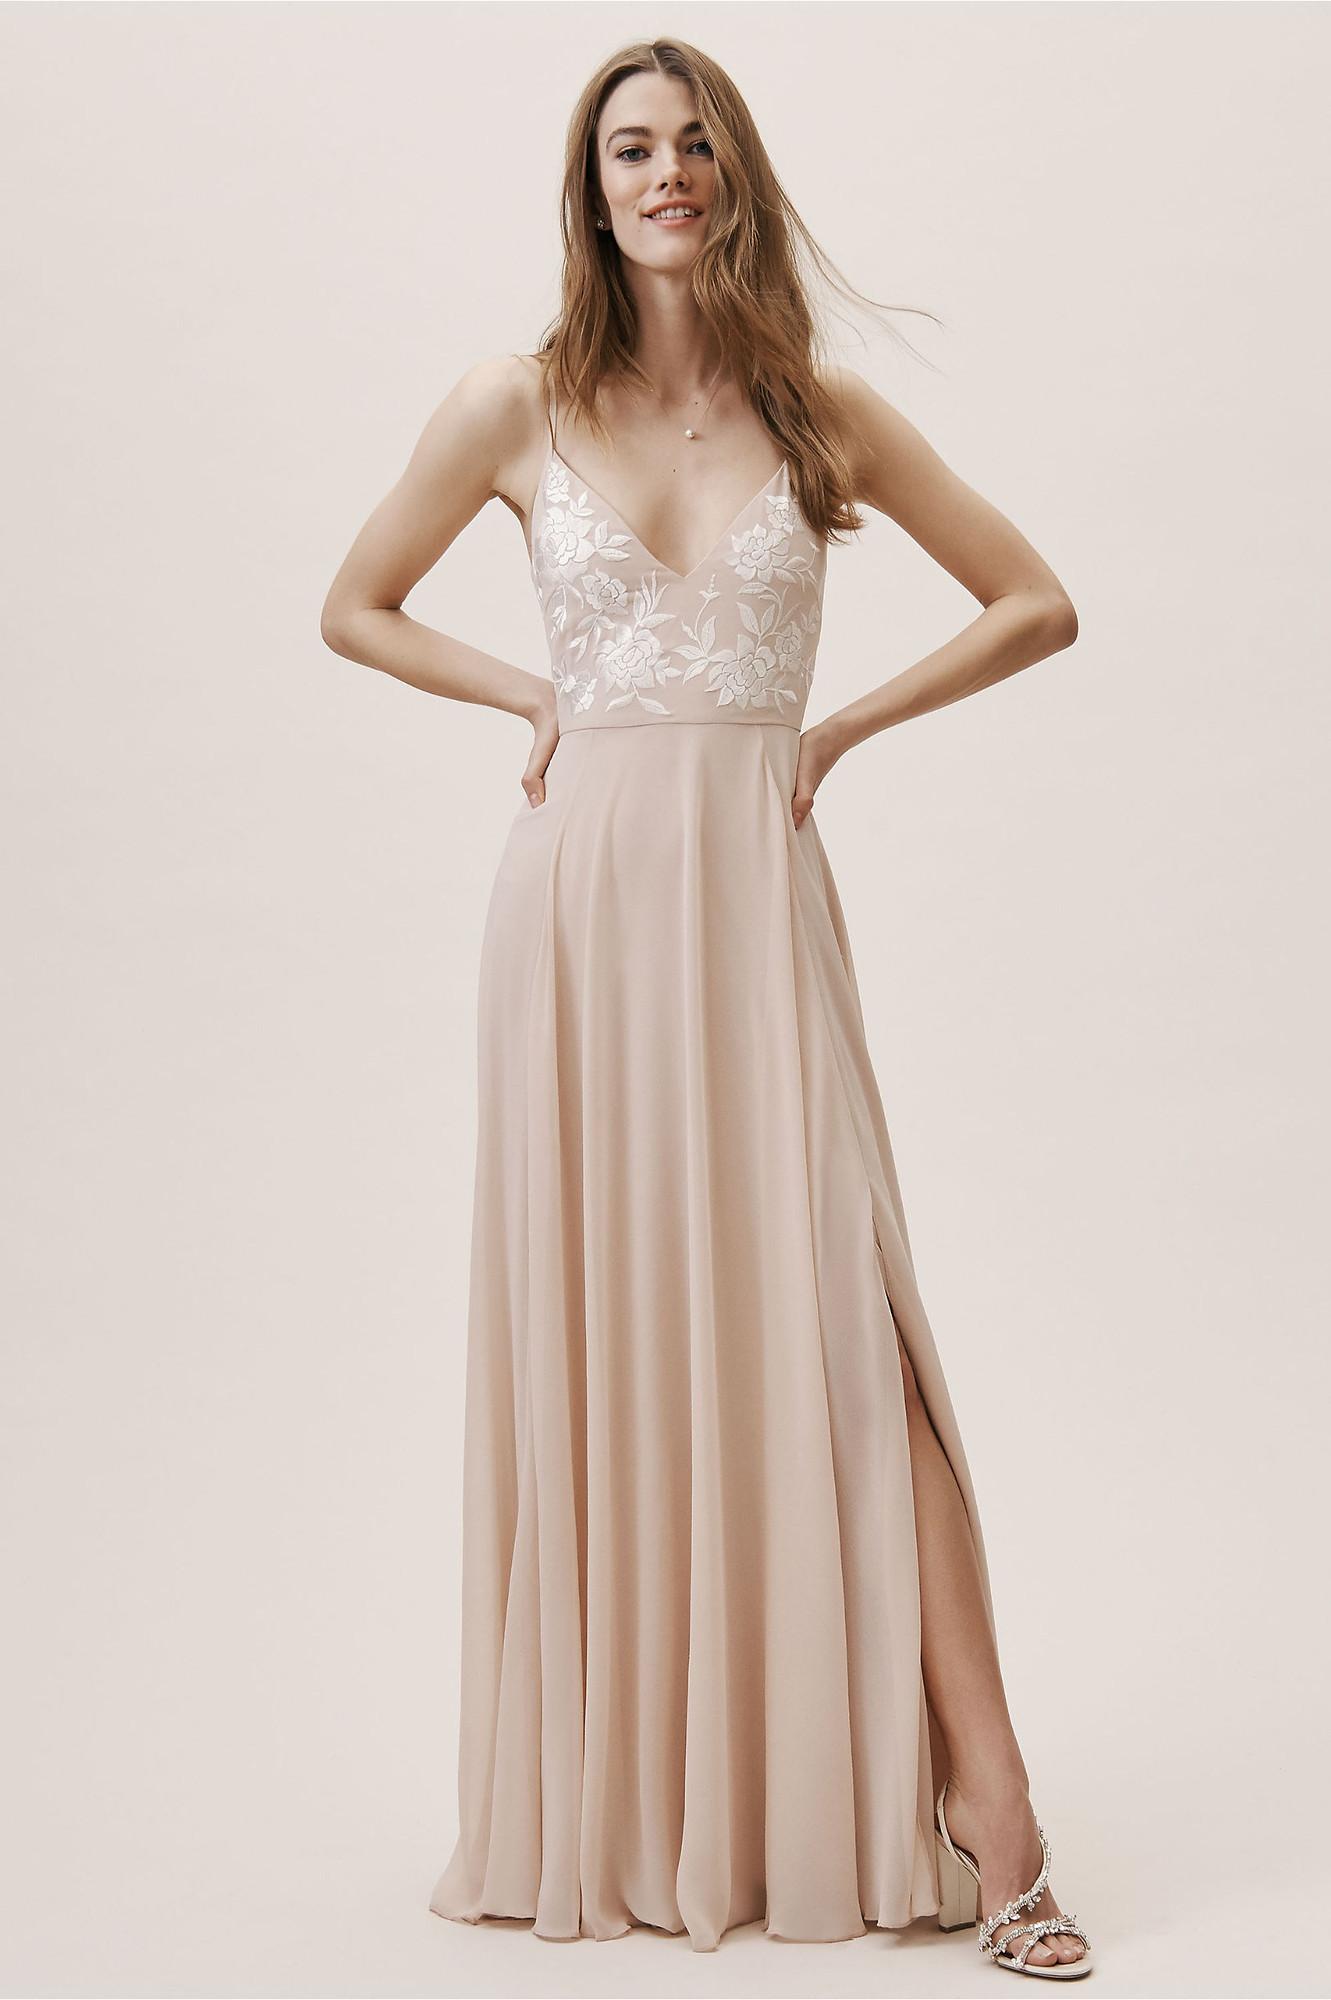 064309ead10 Sadia Dress - Blush A-line Bridesmaid Dress by BHLDN Bridesmaids ...